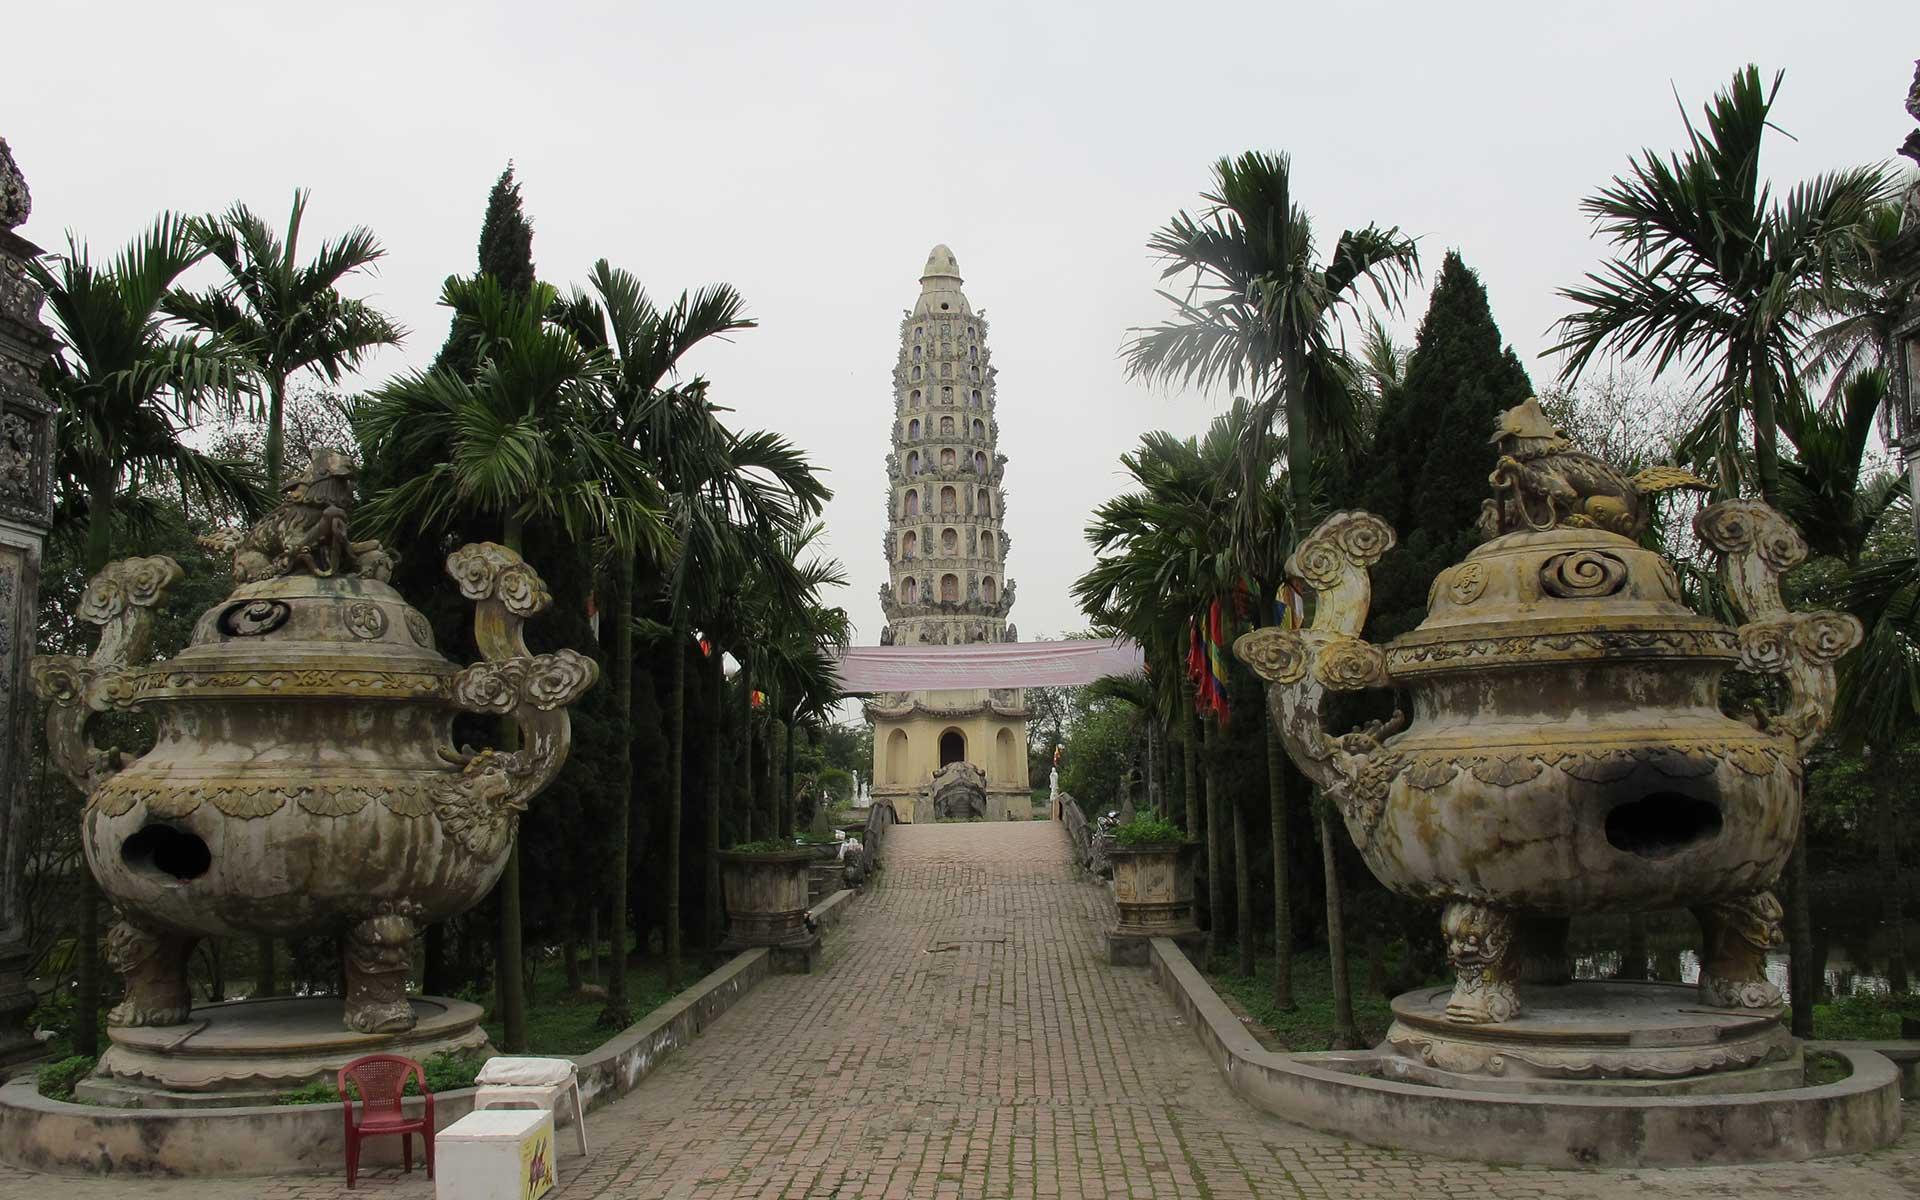 The 12-storey Cuu Pham Lien Hoa Tower